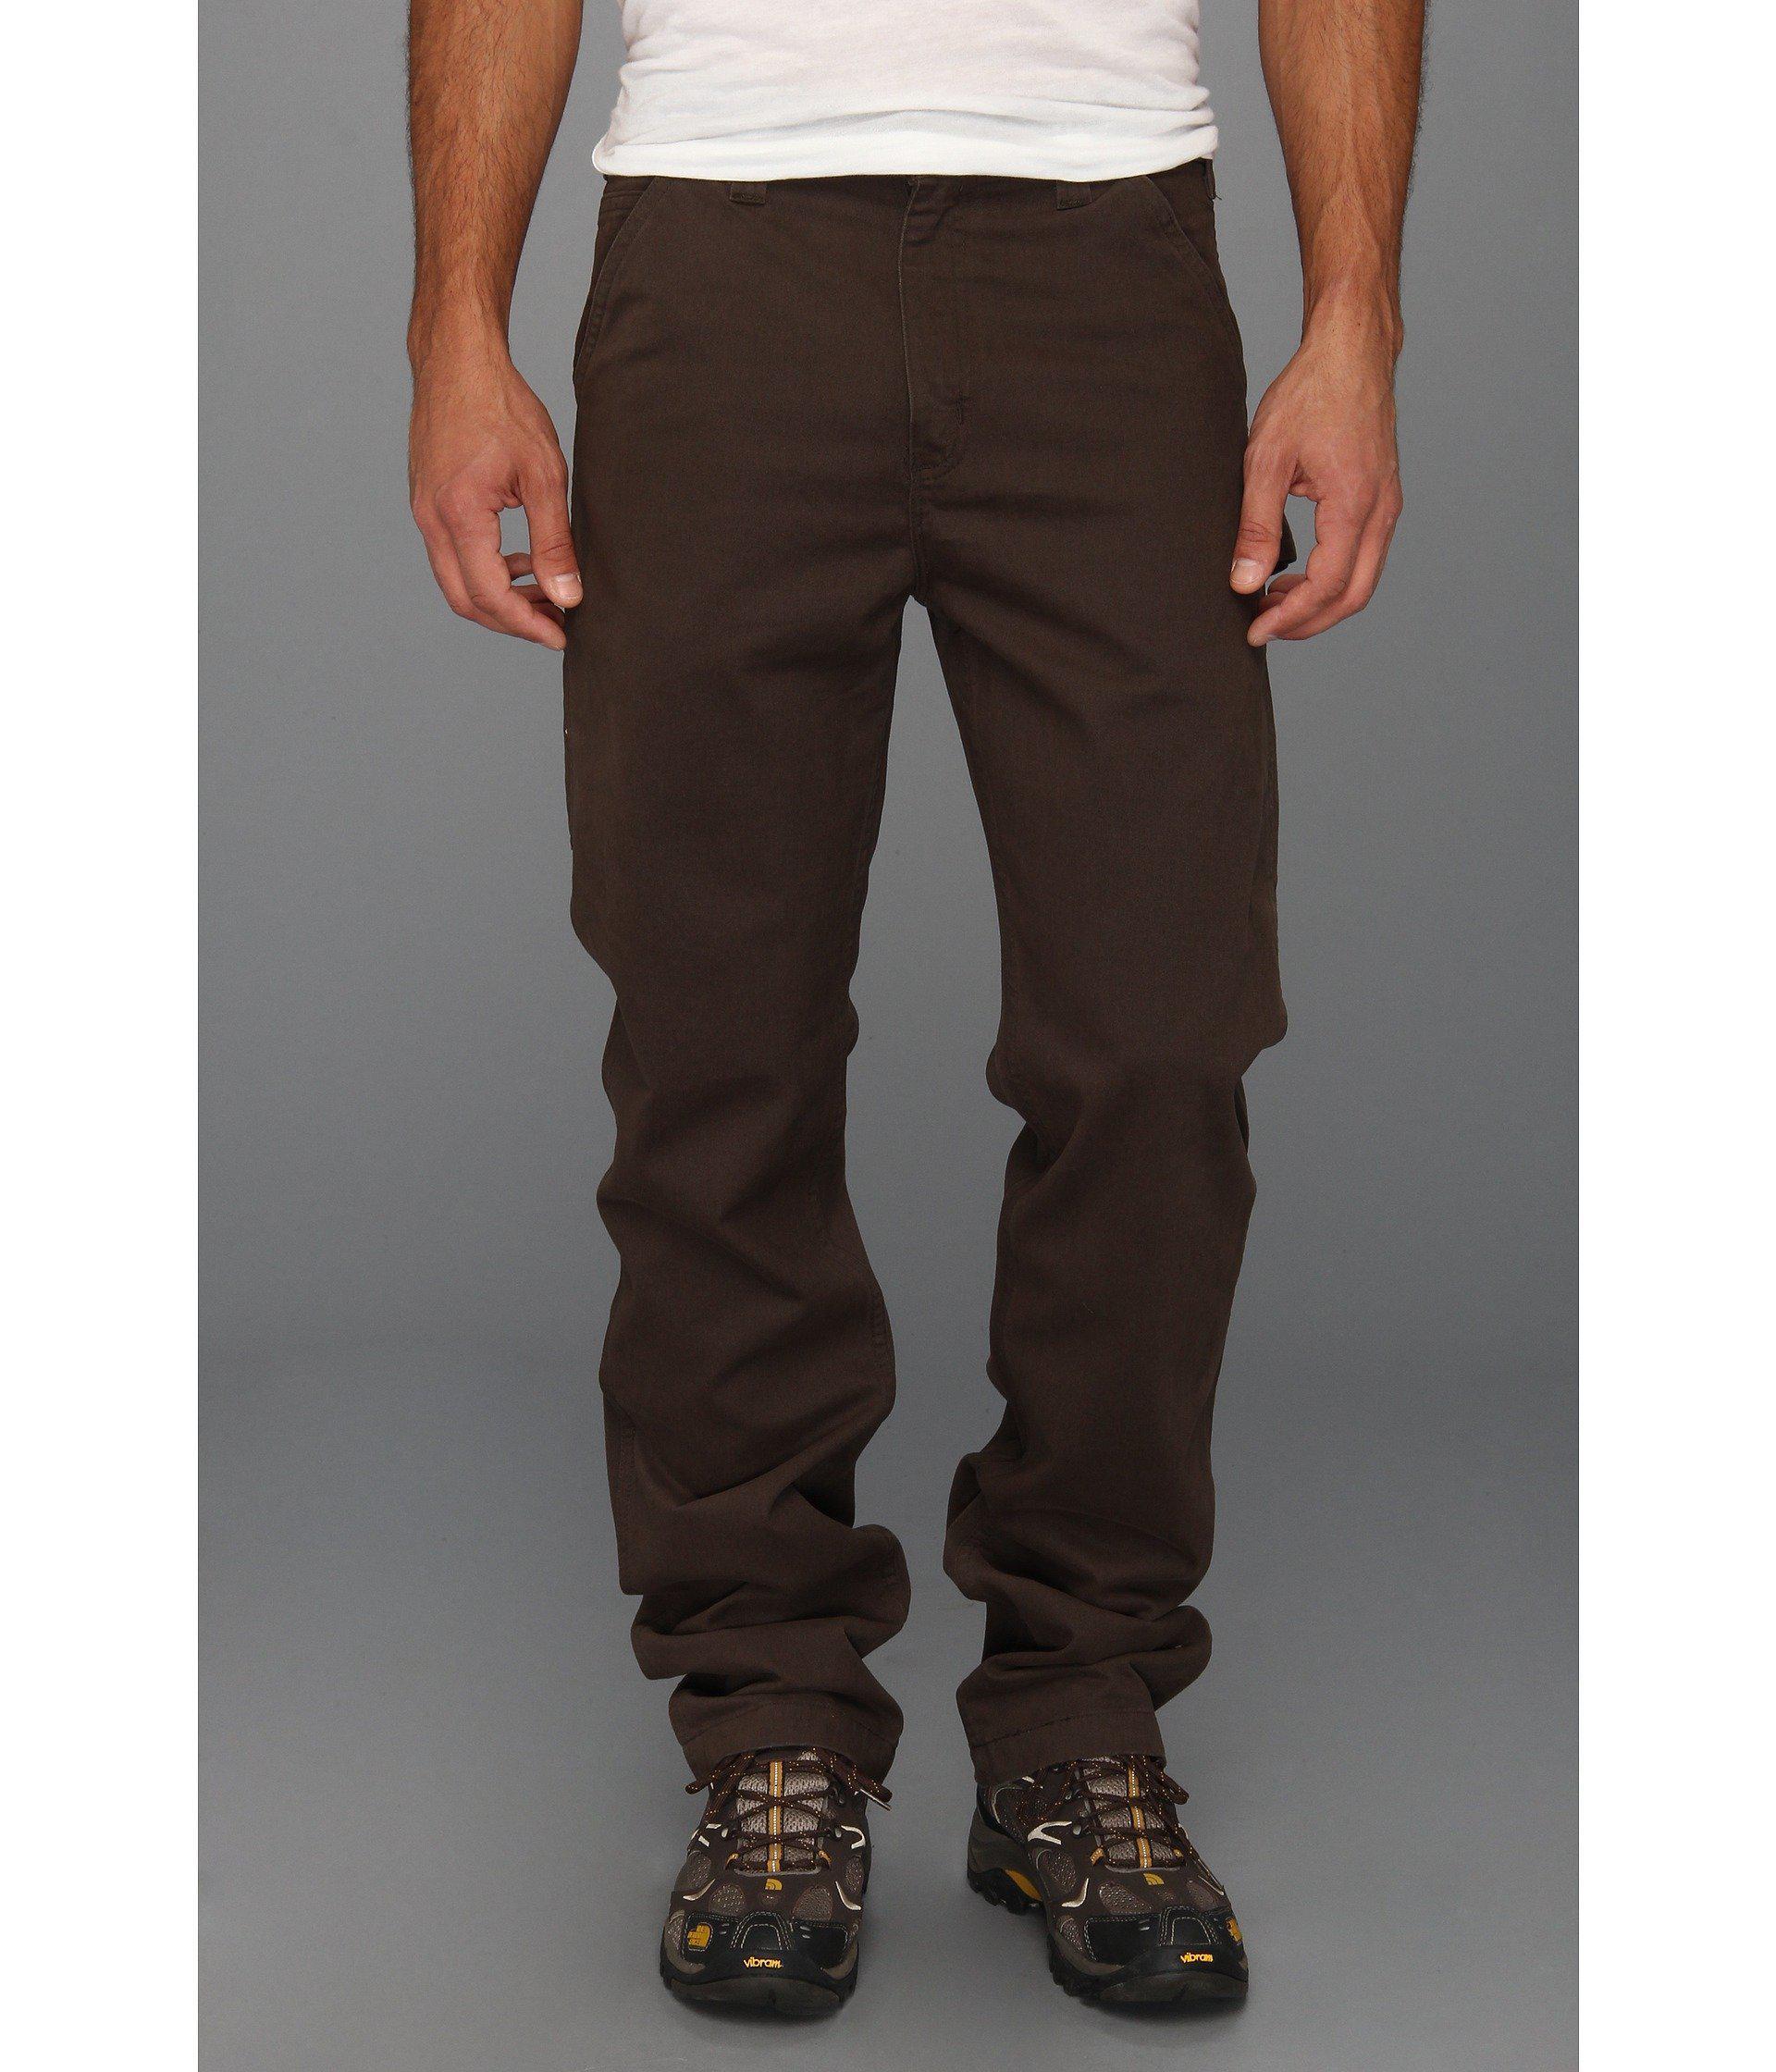 96ec3f4c18b Carhartt Washed Twill Dungaree (field Khaki) Men s Jeans in Brown ...